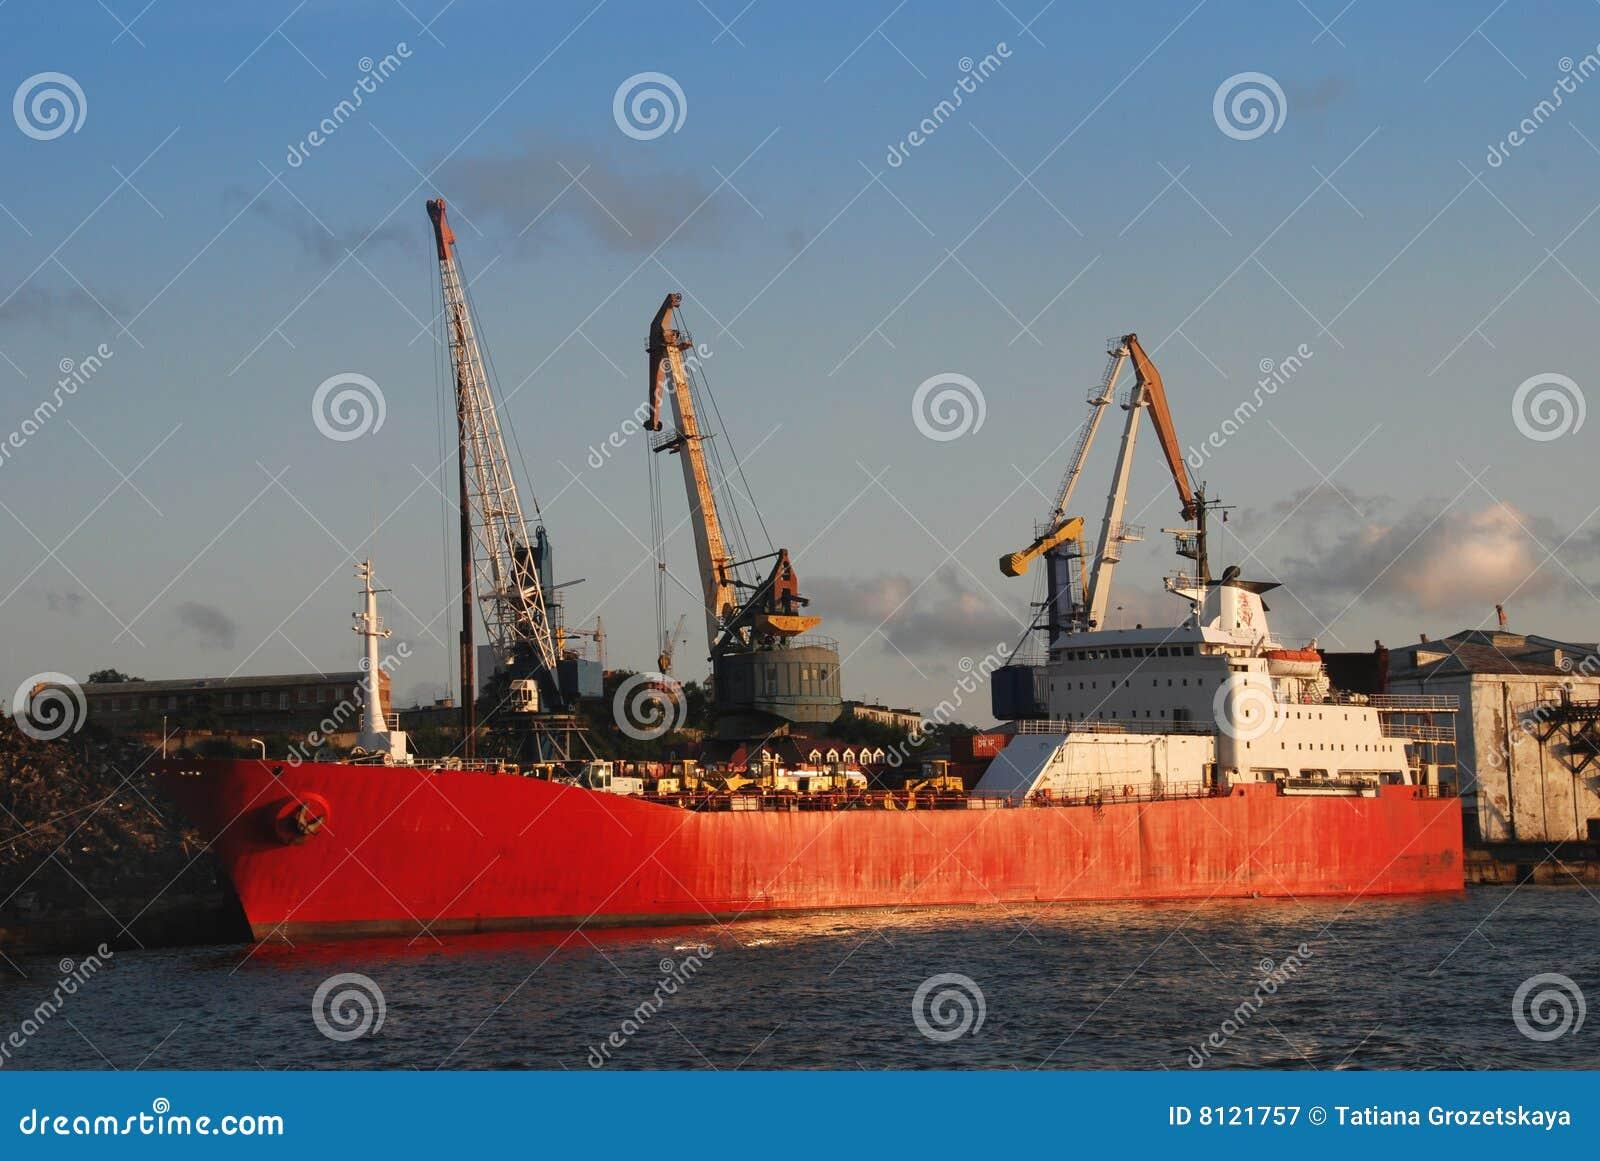 Seaport vladivostok